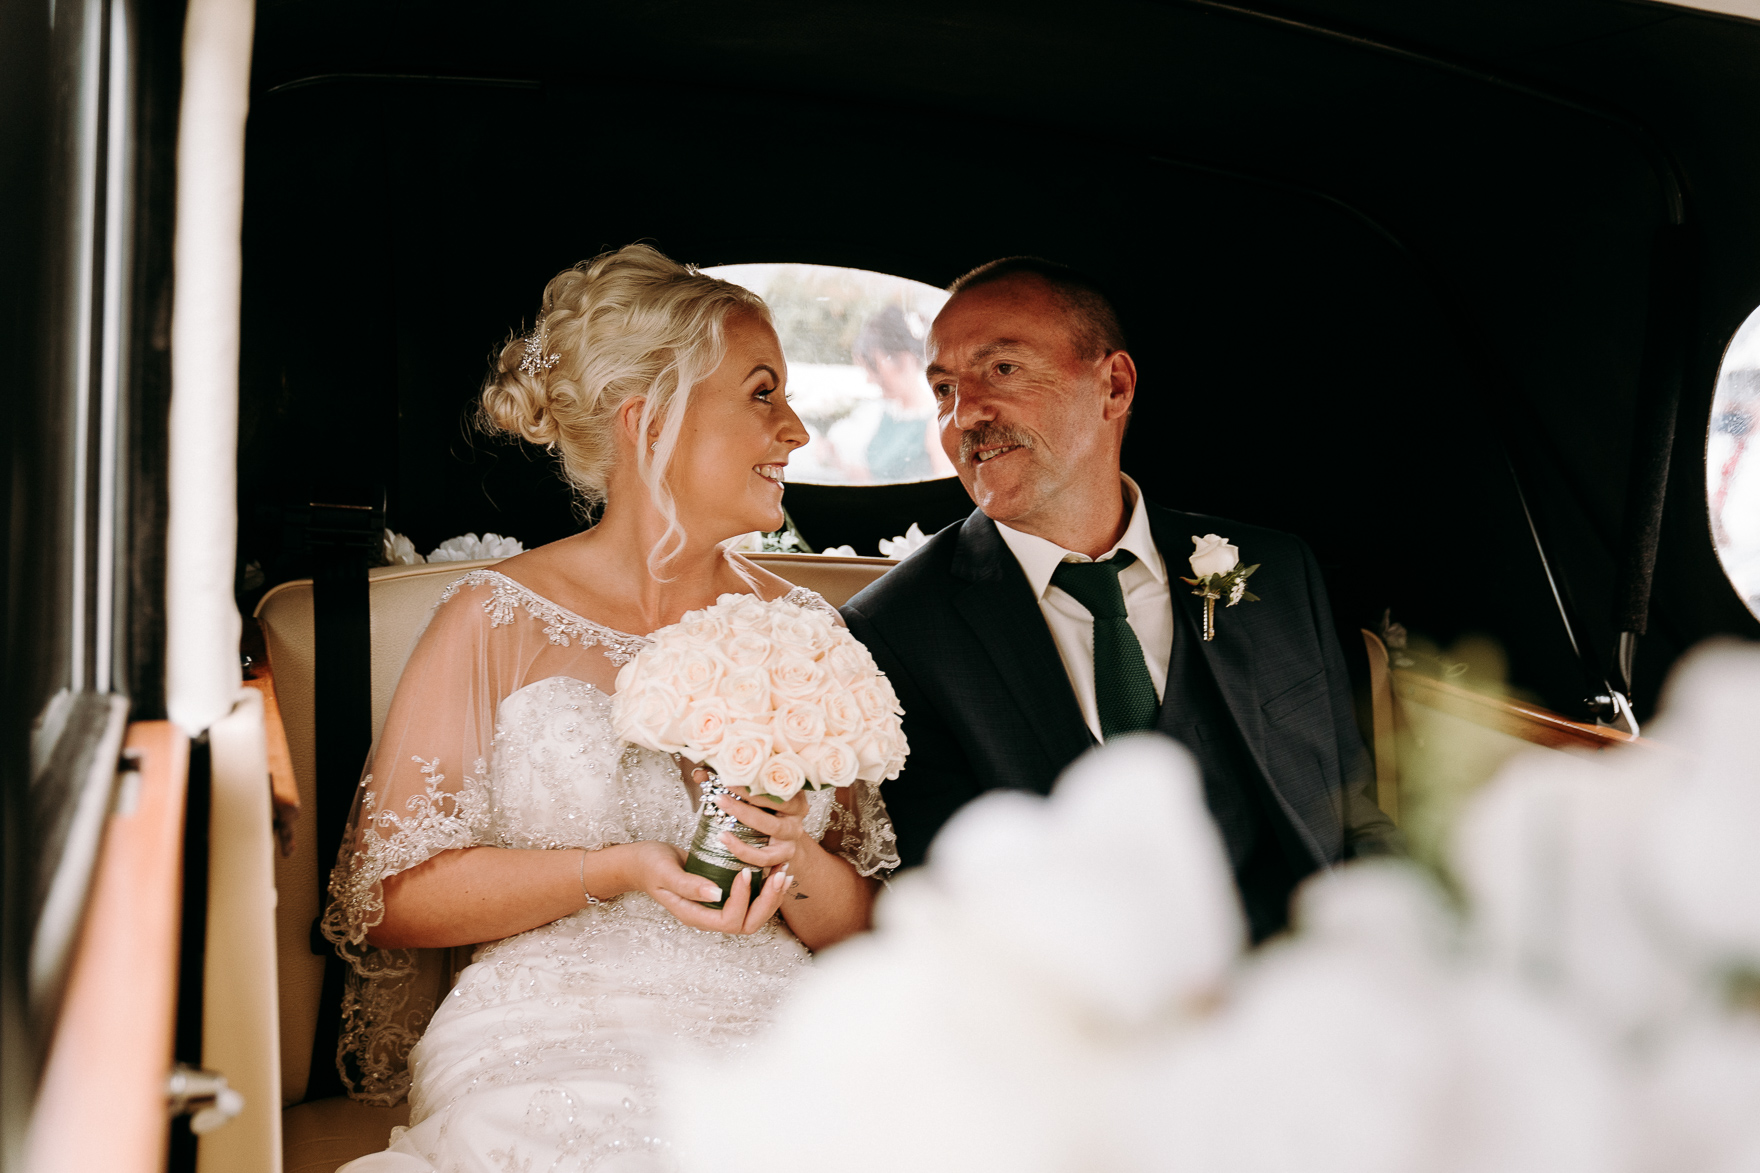 biggest wedding regrets